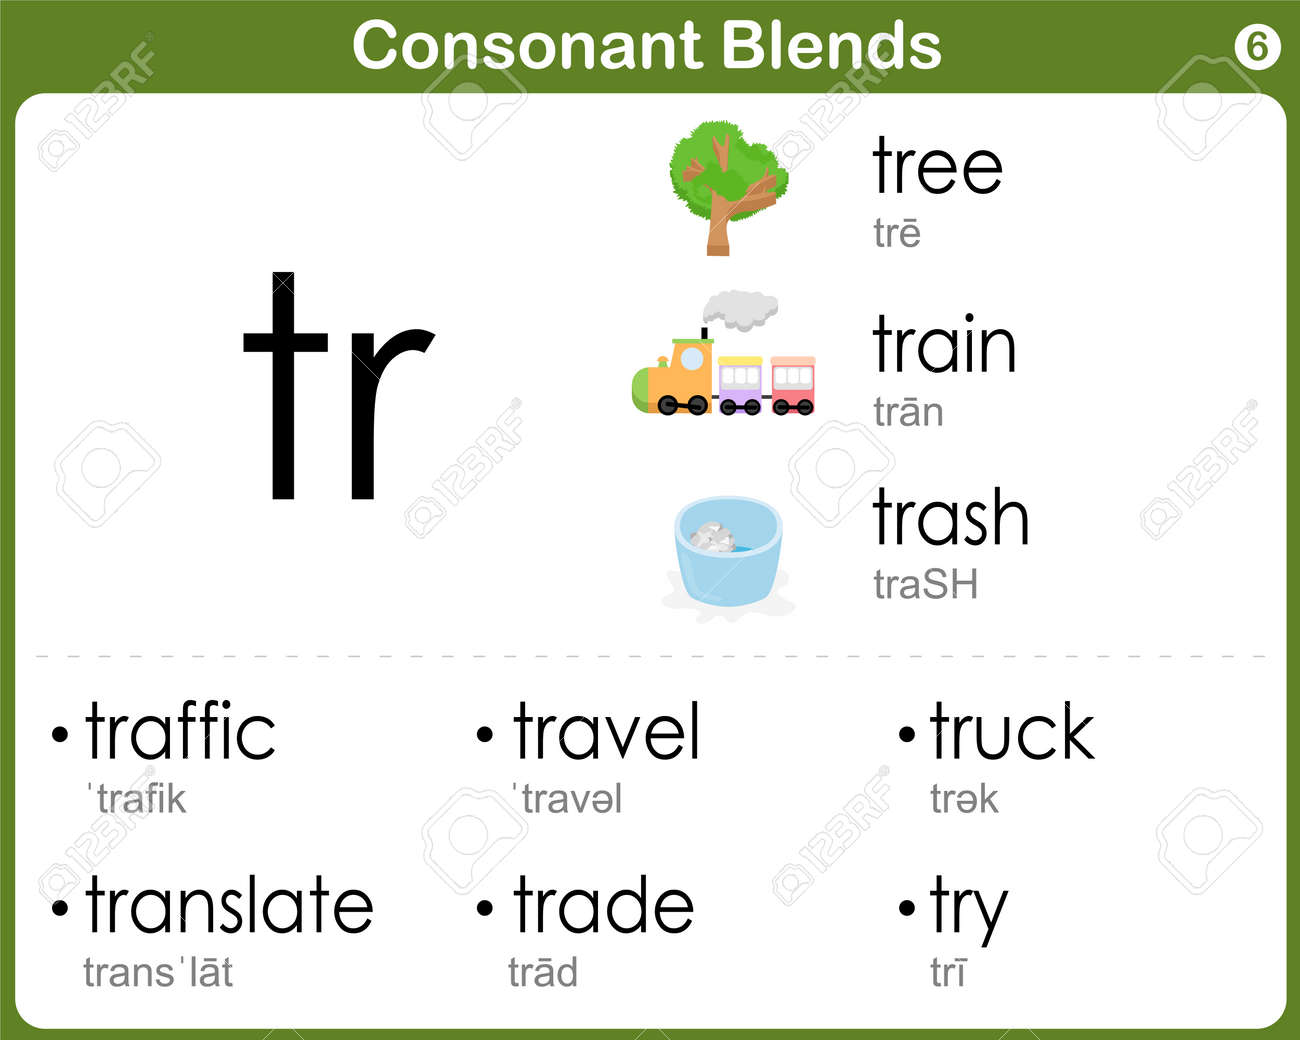 Consonant Blends Worksheet For Kids Royalty Free Cliparts, Vectors ...